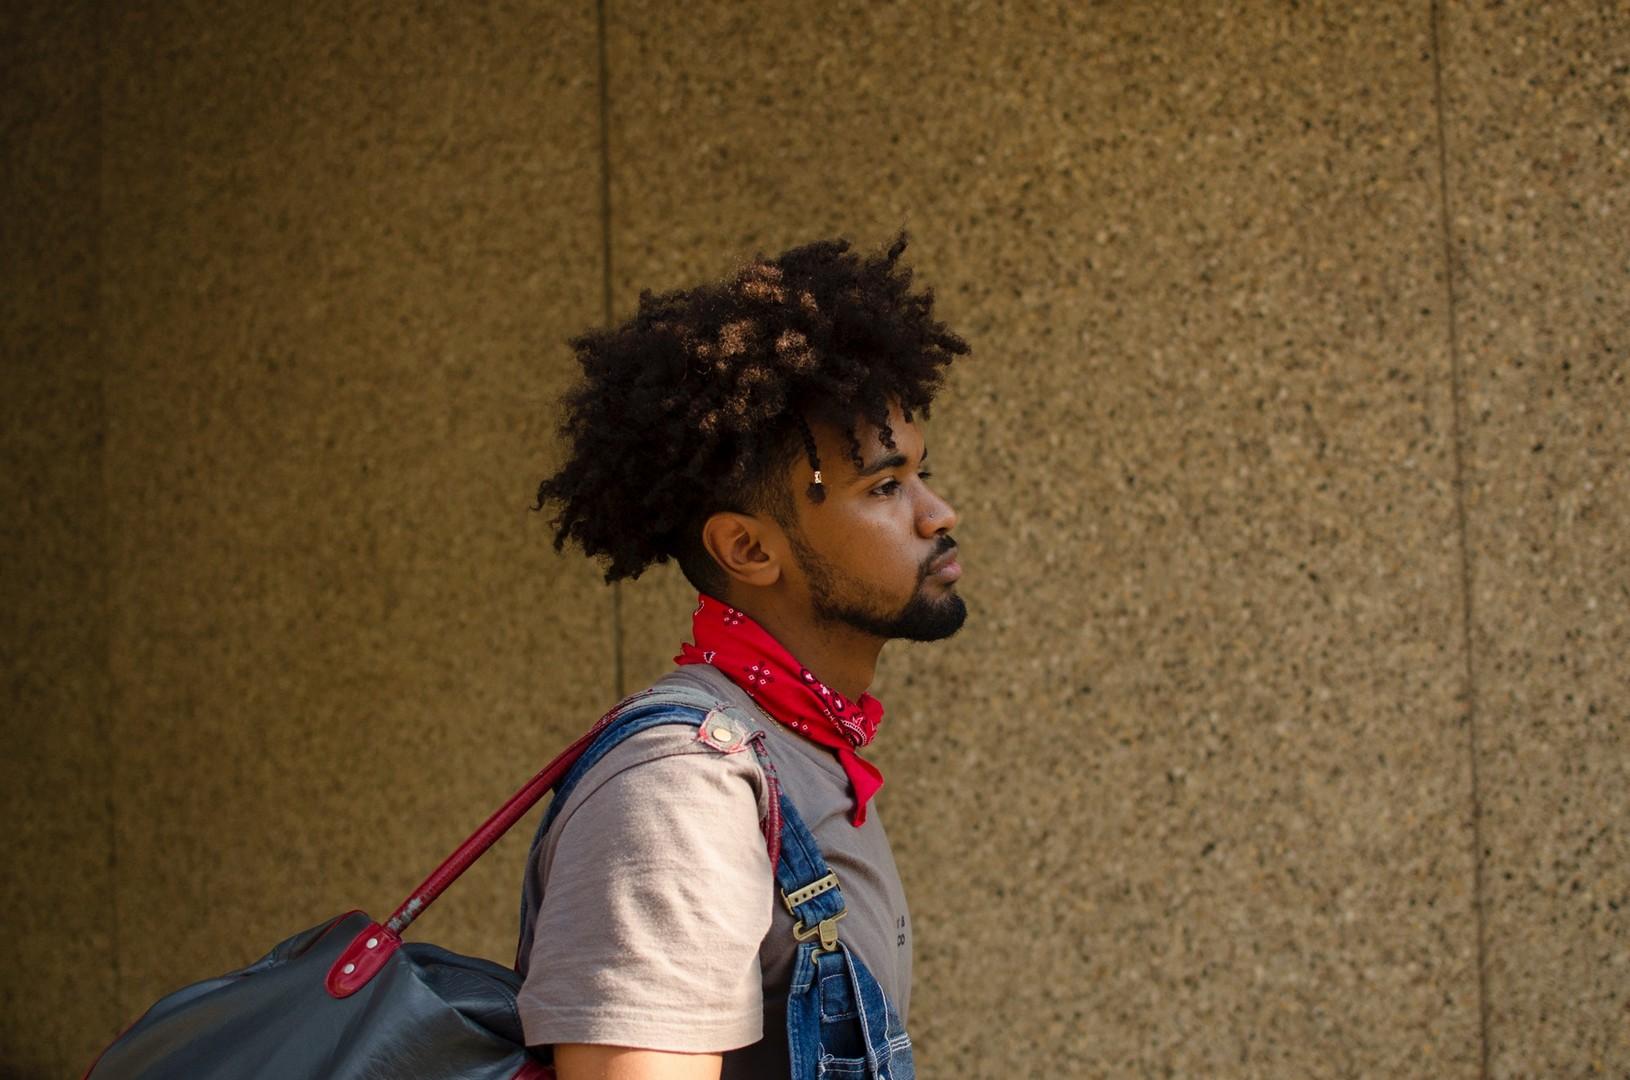 devonrockola nappy 5569 - Cortes de cabelo masculino: Dicas de cortes para apostar sem medo